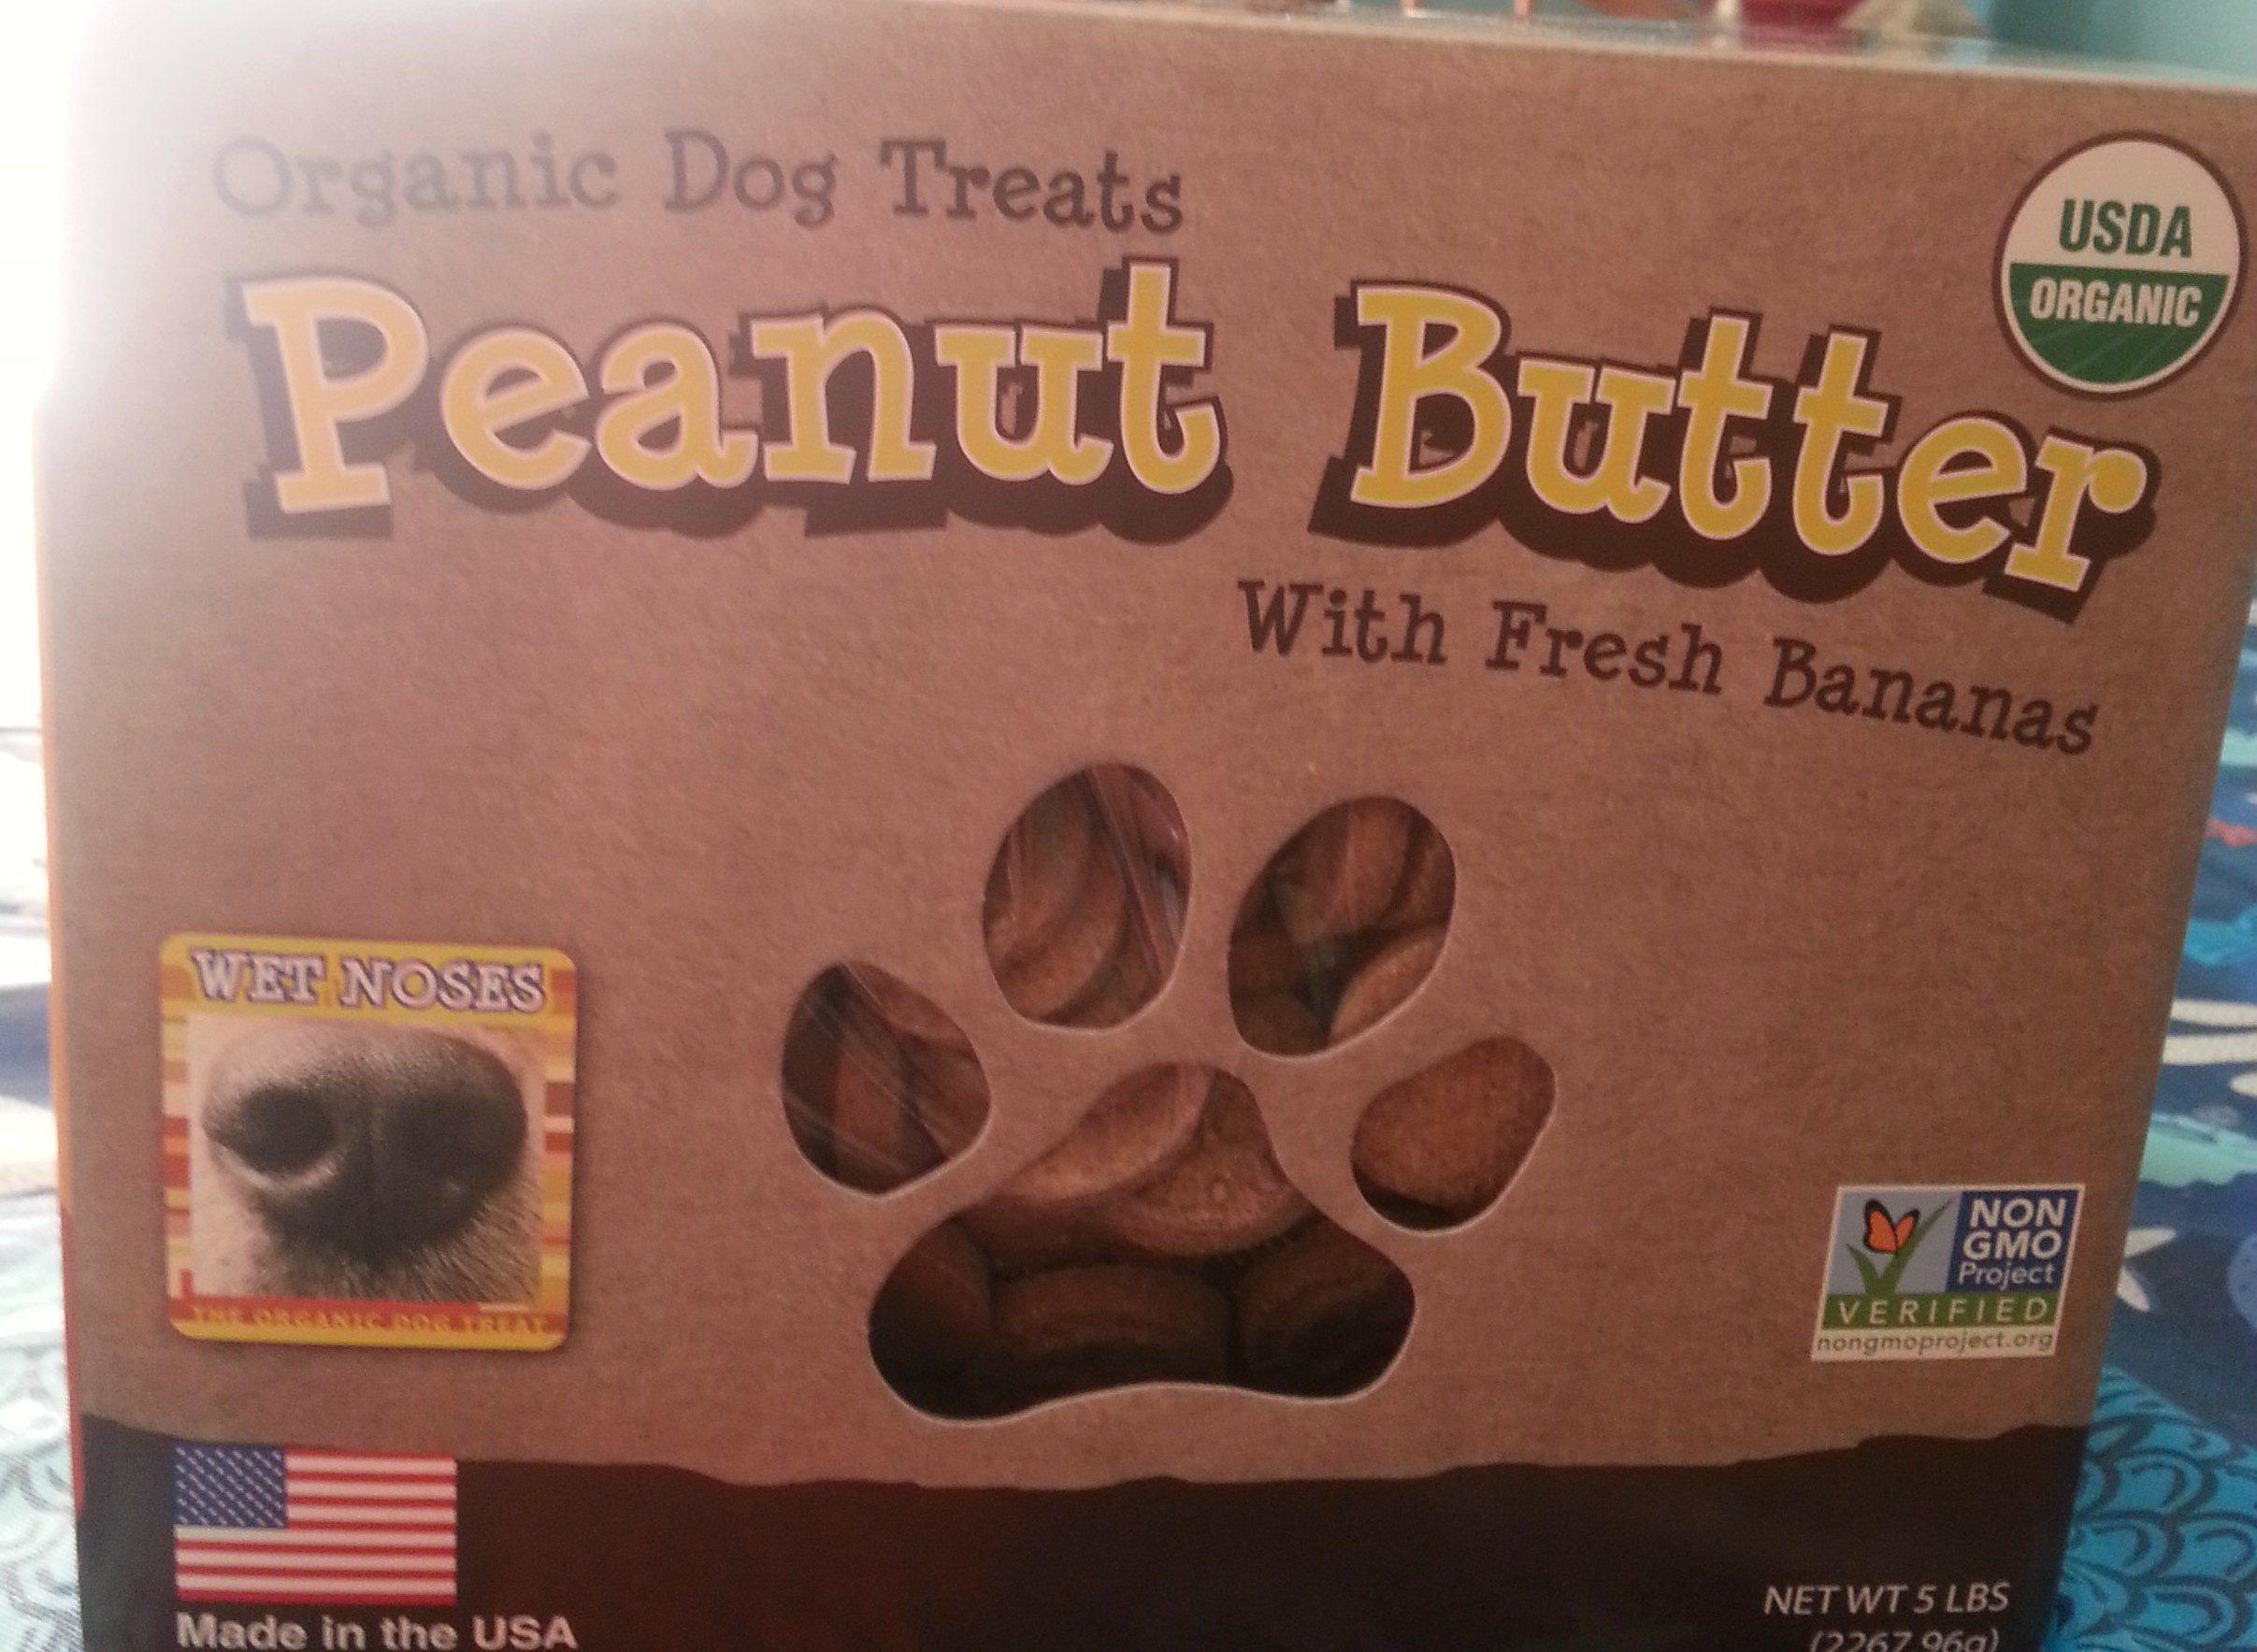 organic dog treats peanut butter with fresh bannas - Product - en